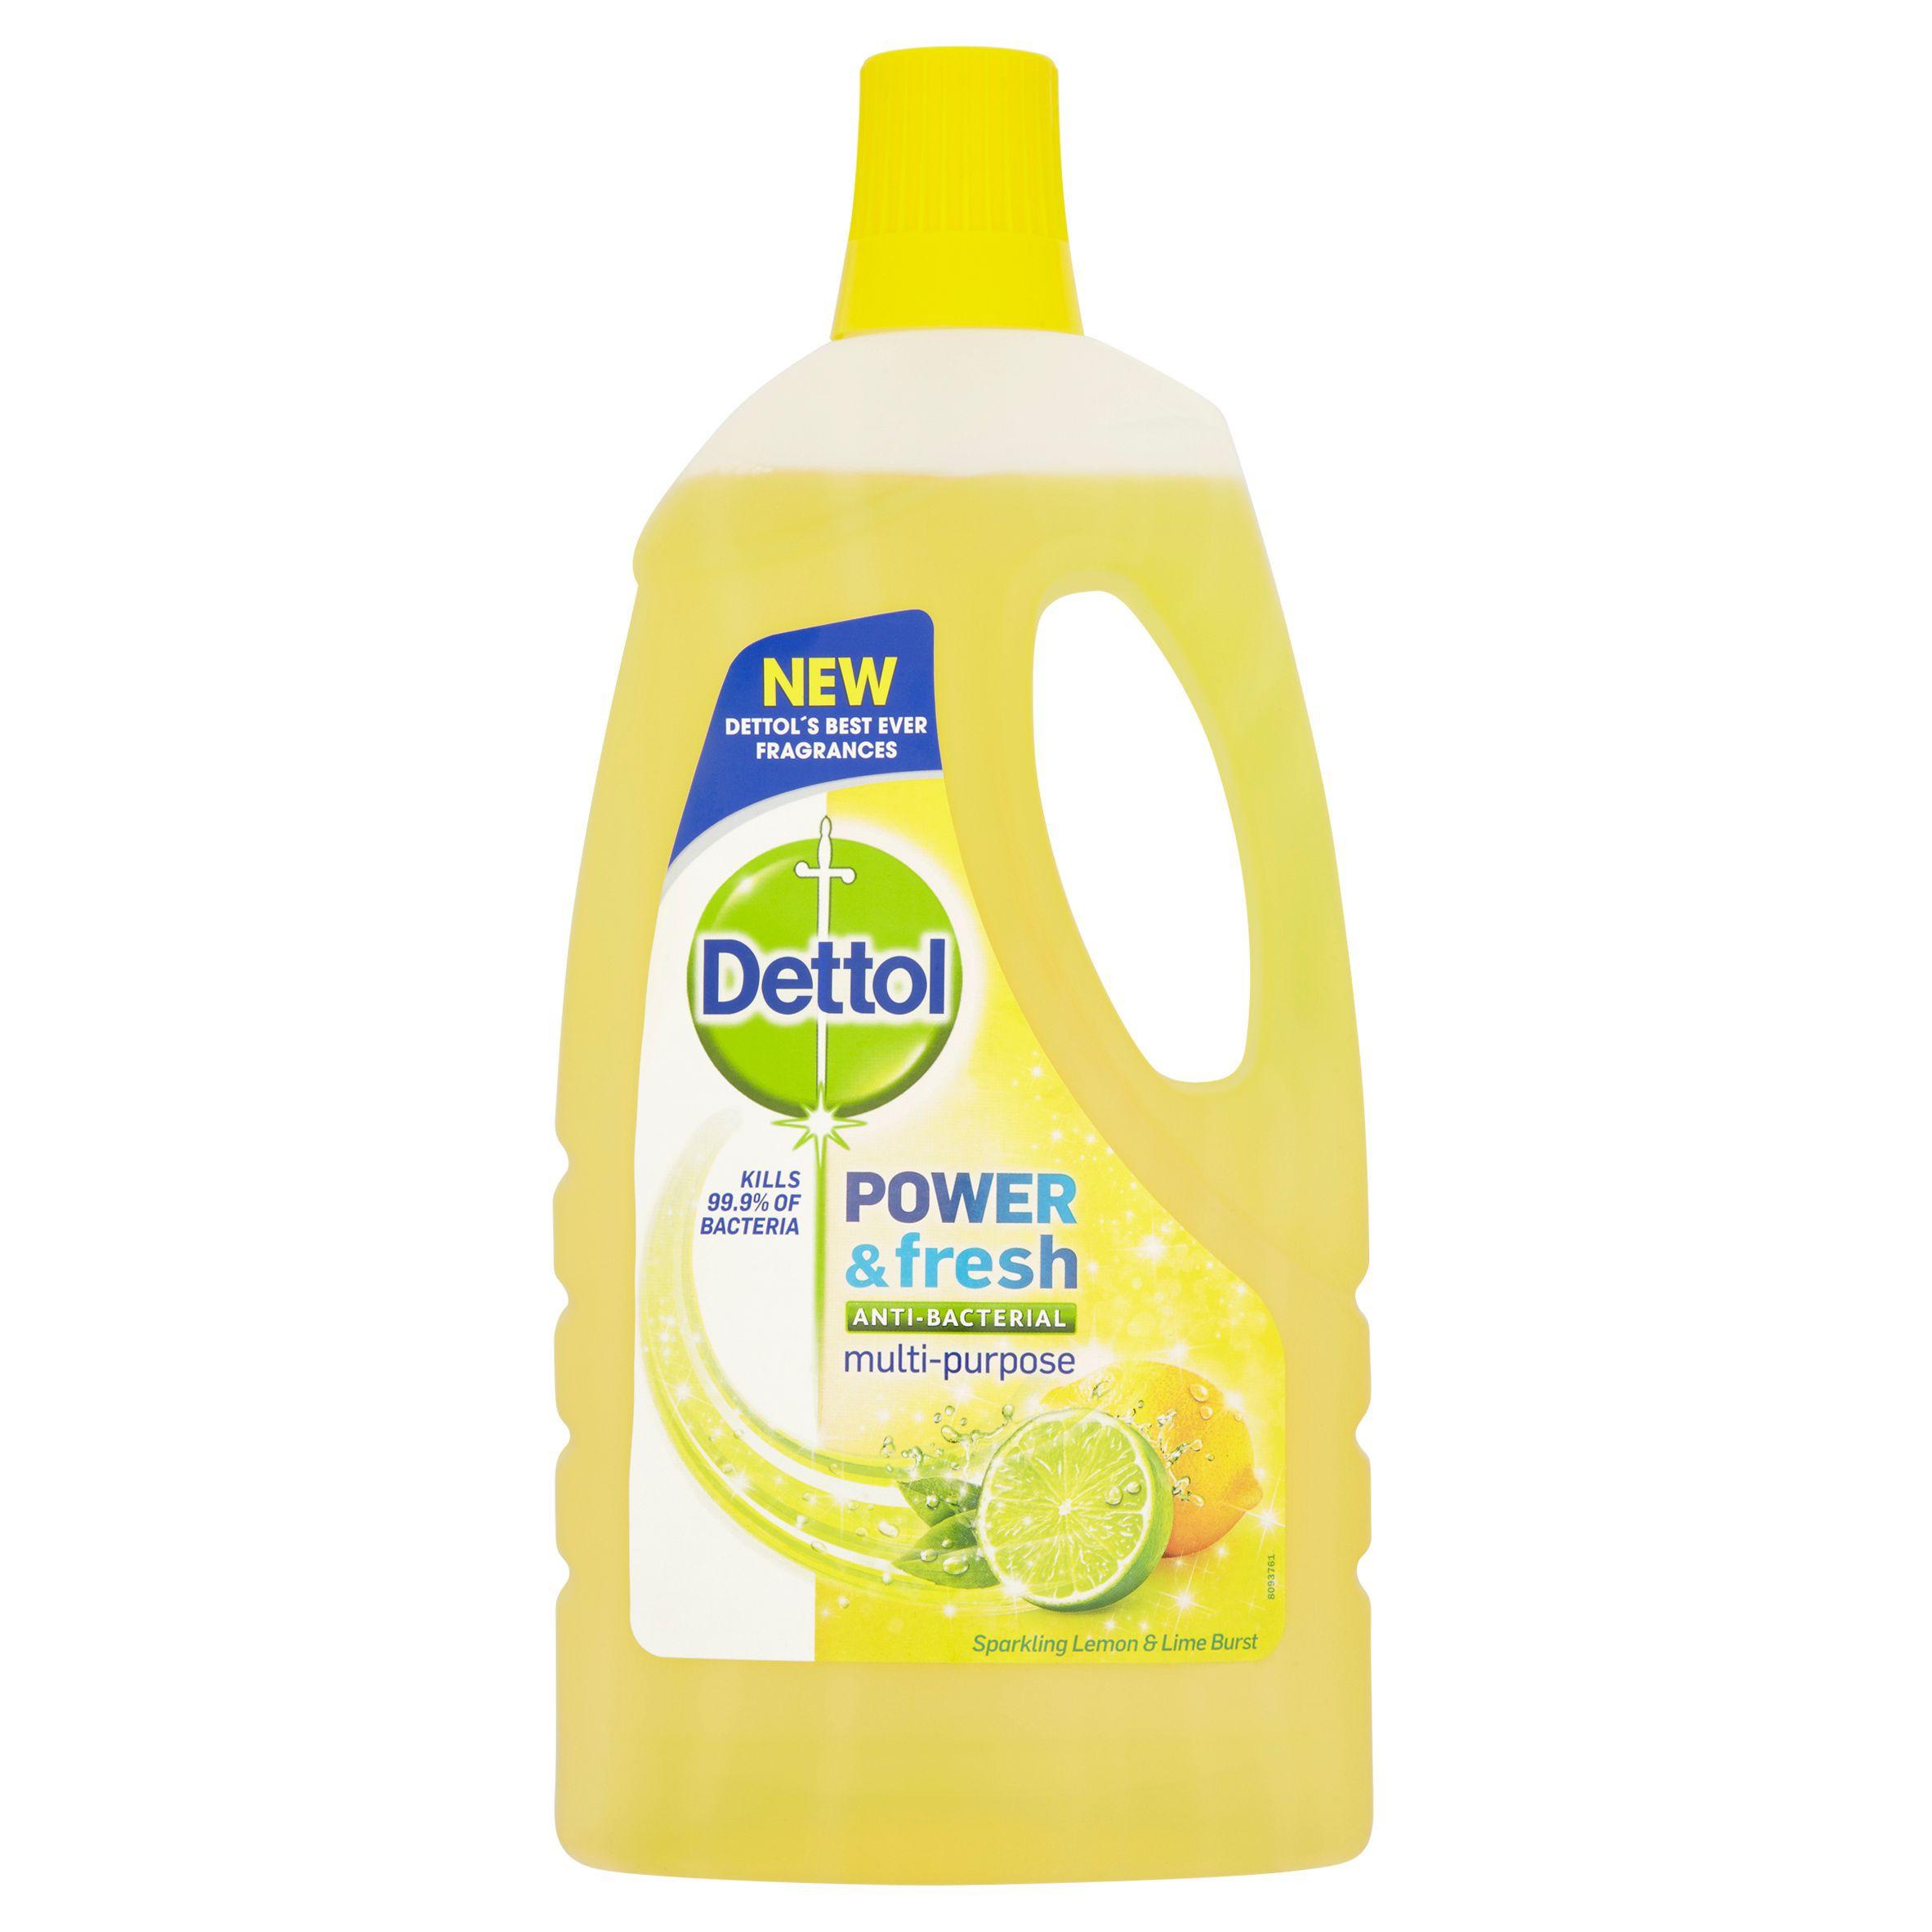 Cif power amp shine bathroom - Dettol Citrus Power Fresh Multi Purpose Floor Cleaner 1 L